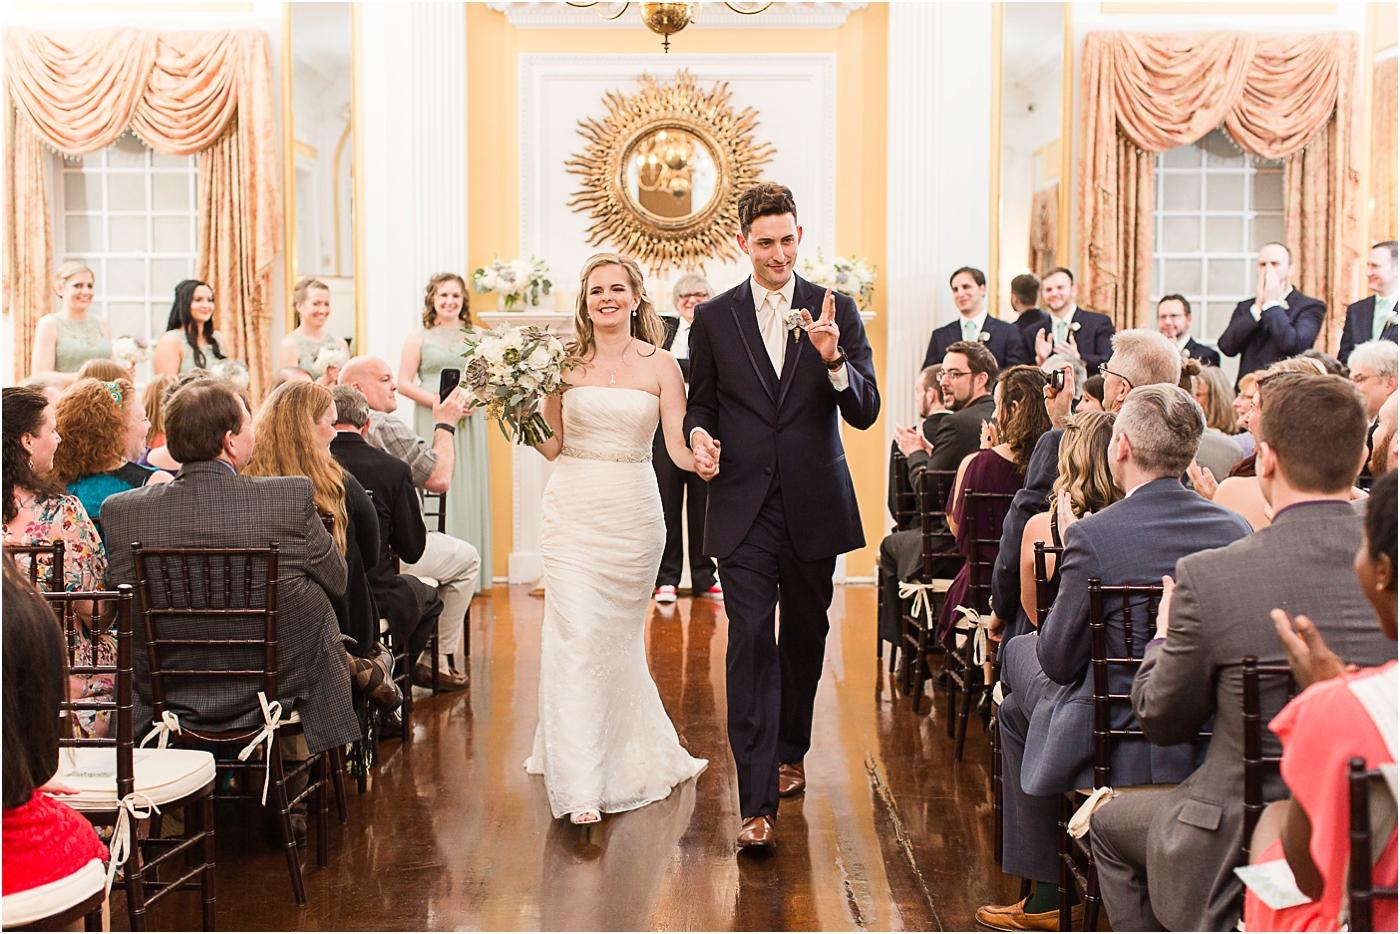 Greyrock-mansion-wedding-91.jpg